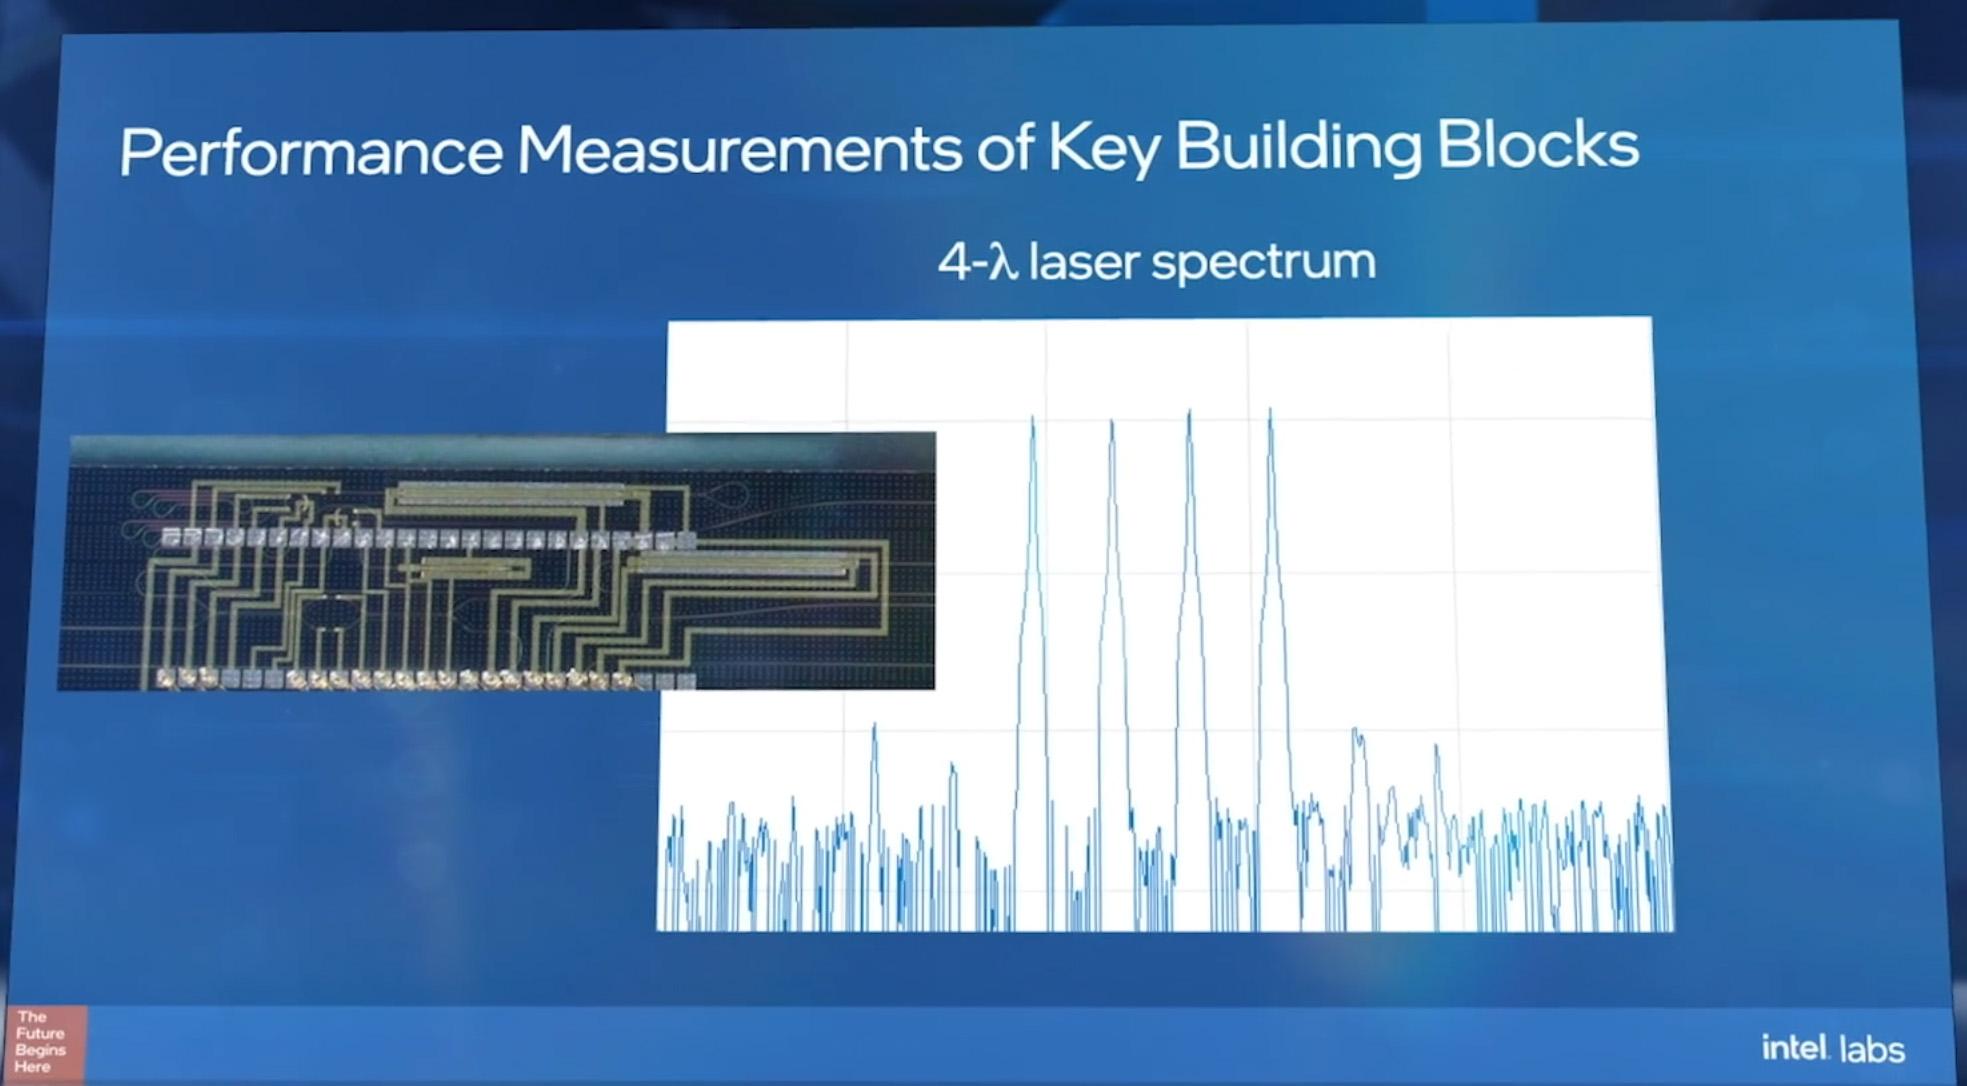 multiwavelength-laser